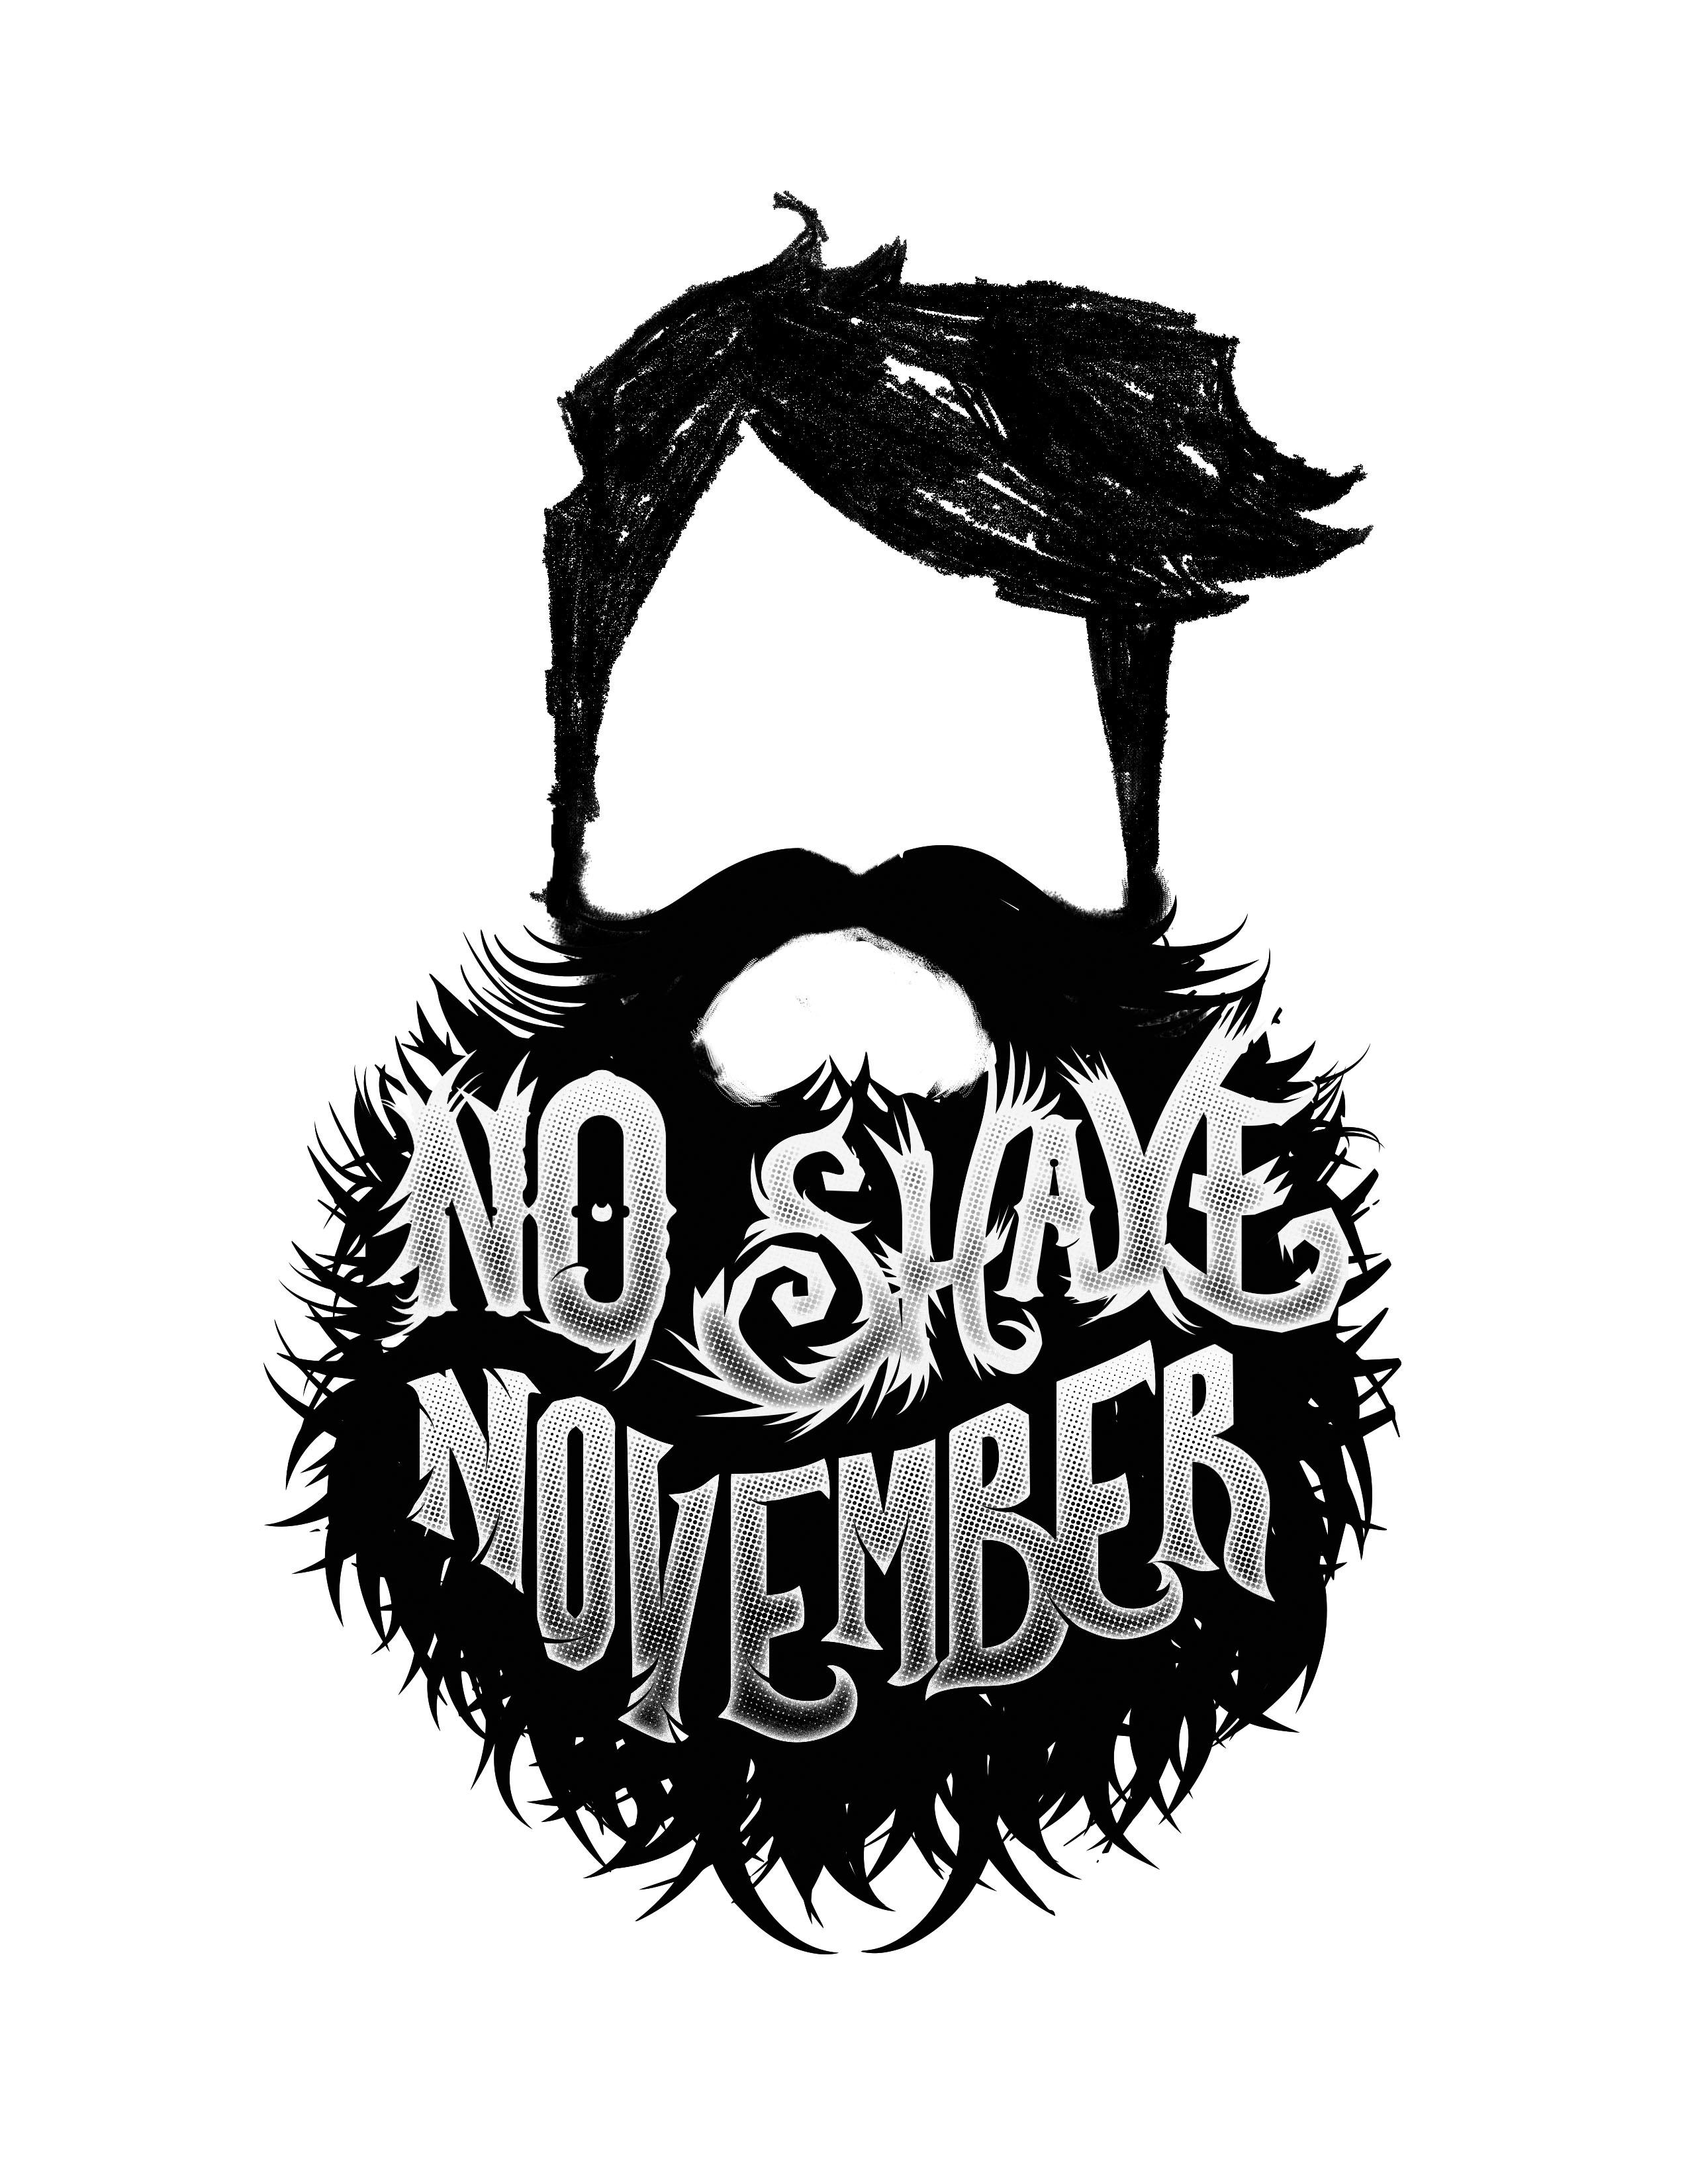 http://acranger.com/wp-content/uploads/2014/12/No-Shave.jpg